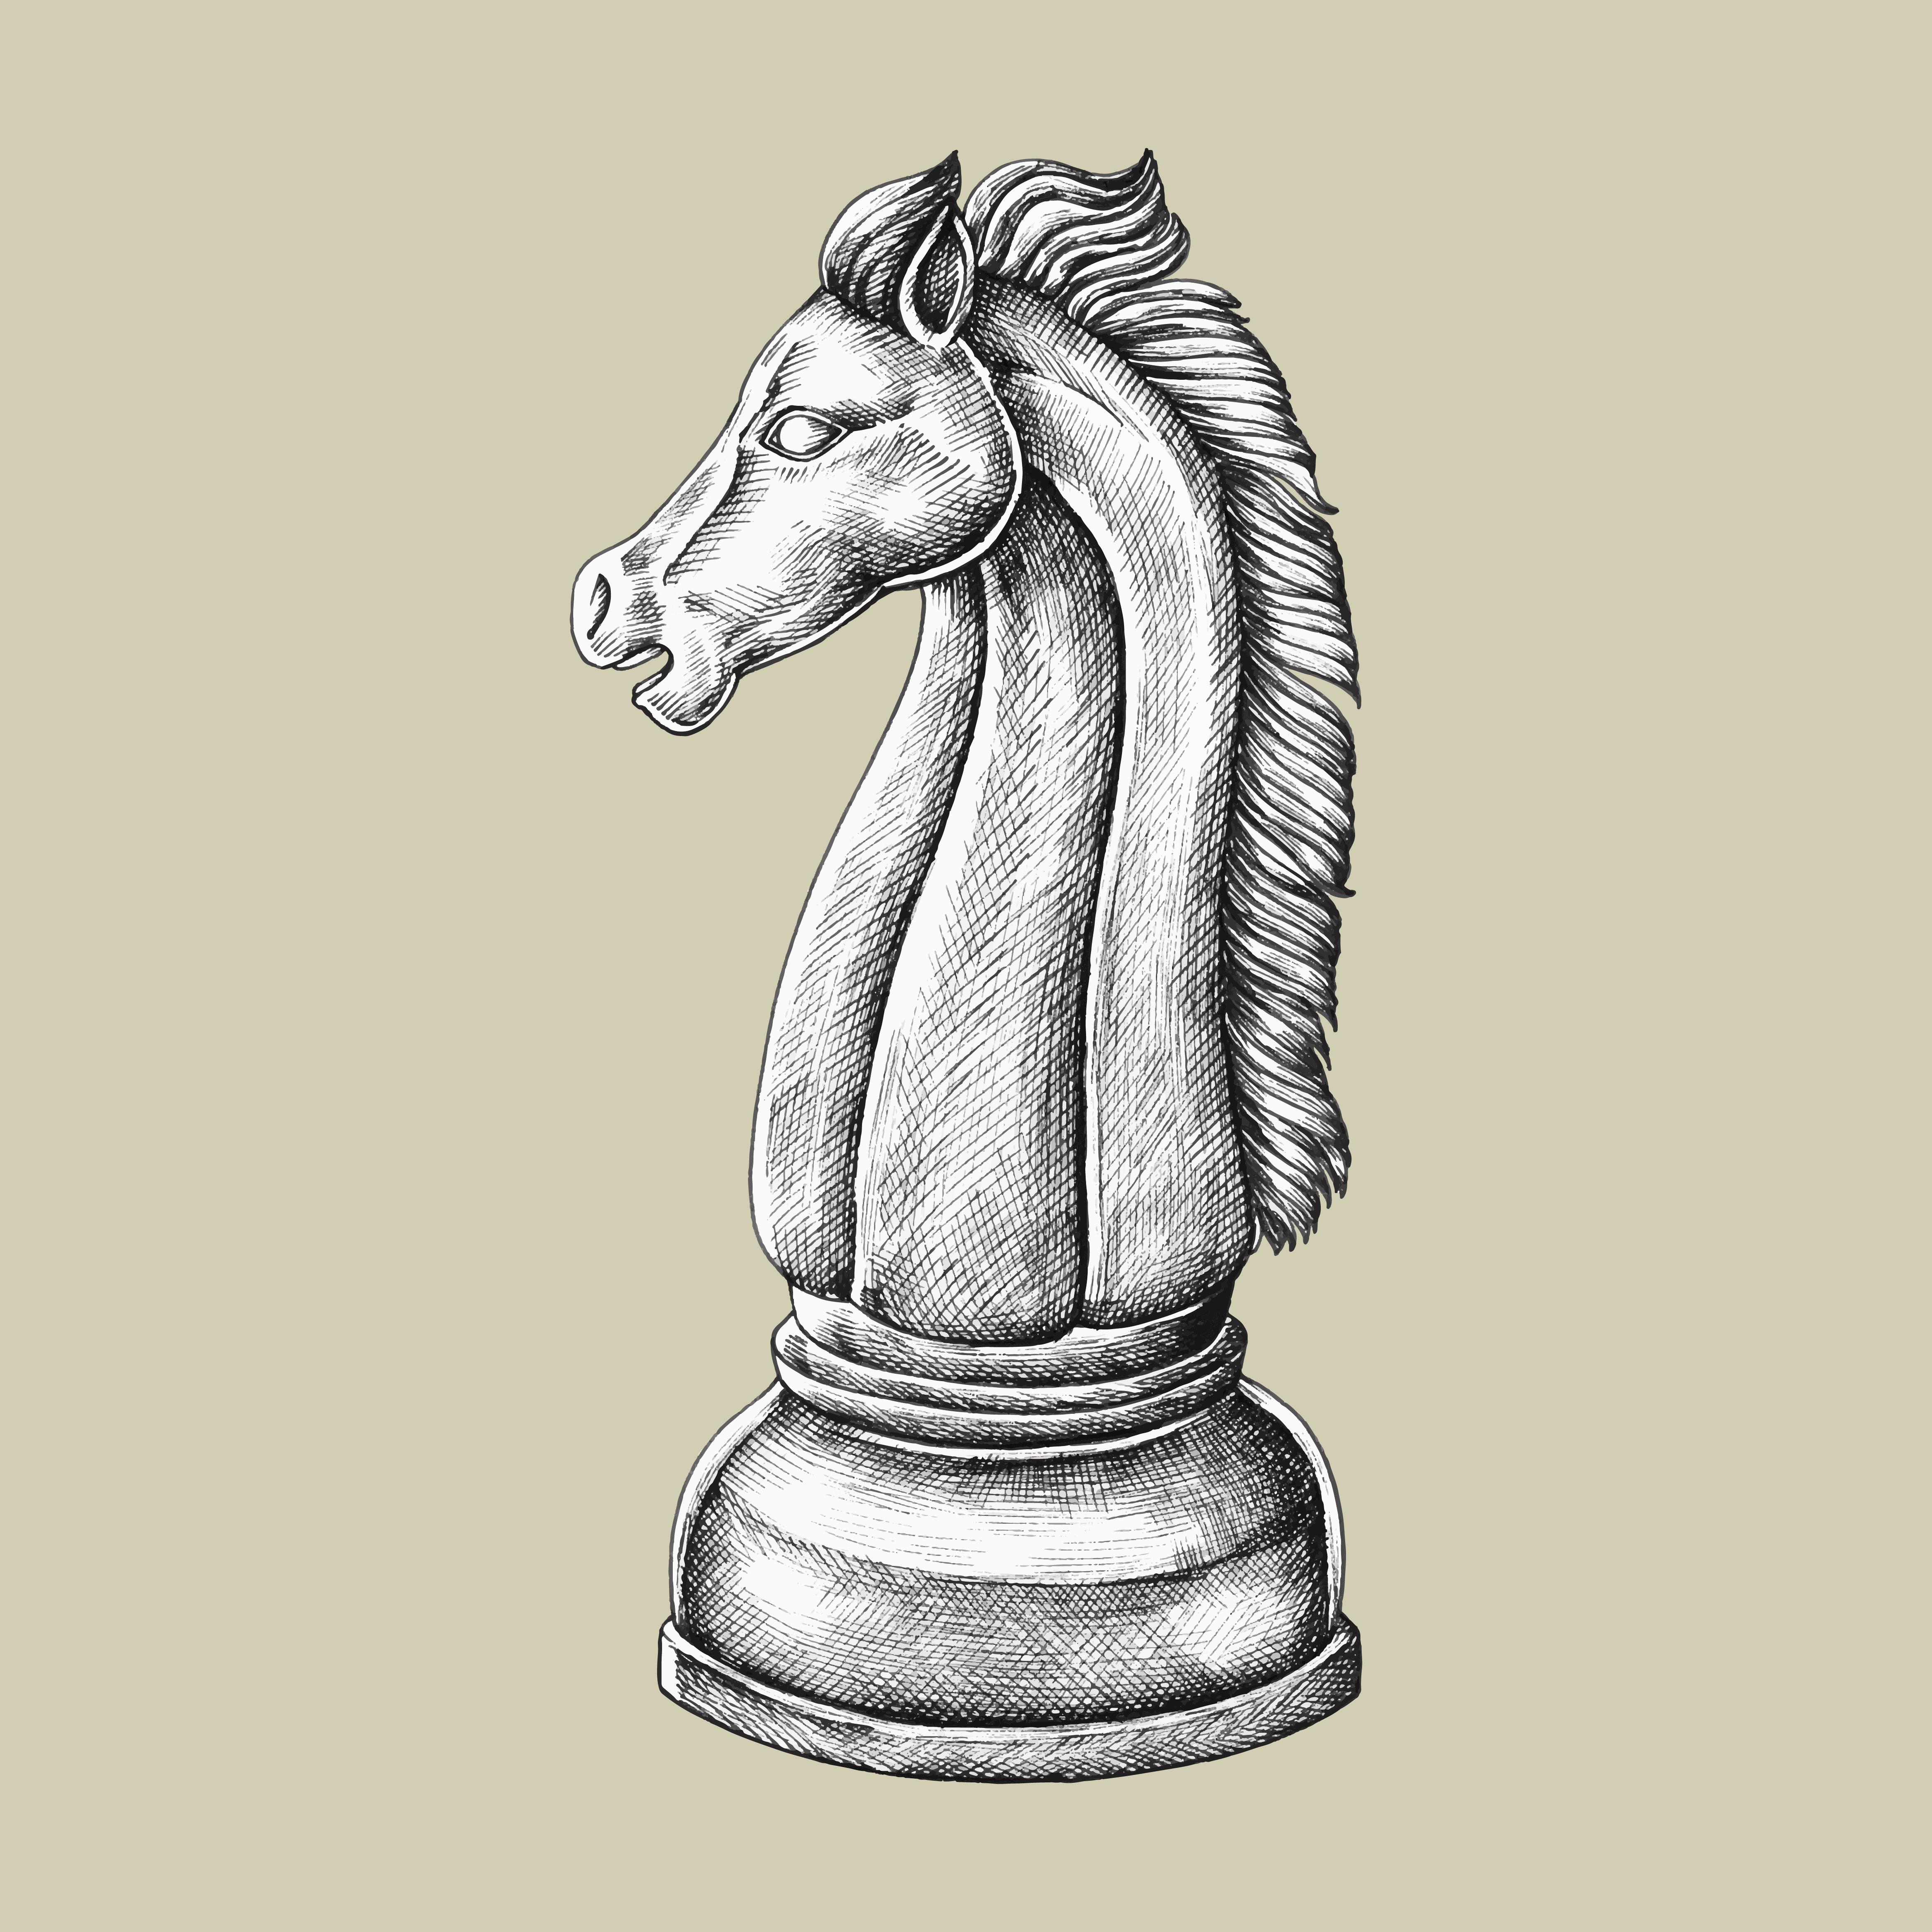 Hand-drawn chess knight illustration - Download Free ...